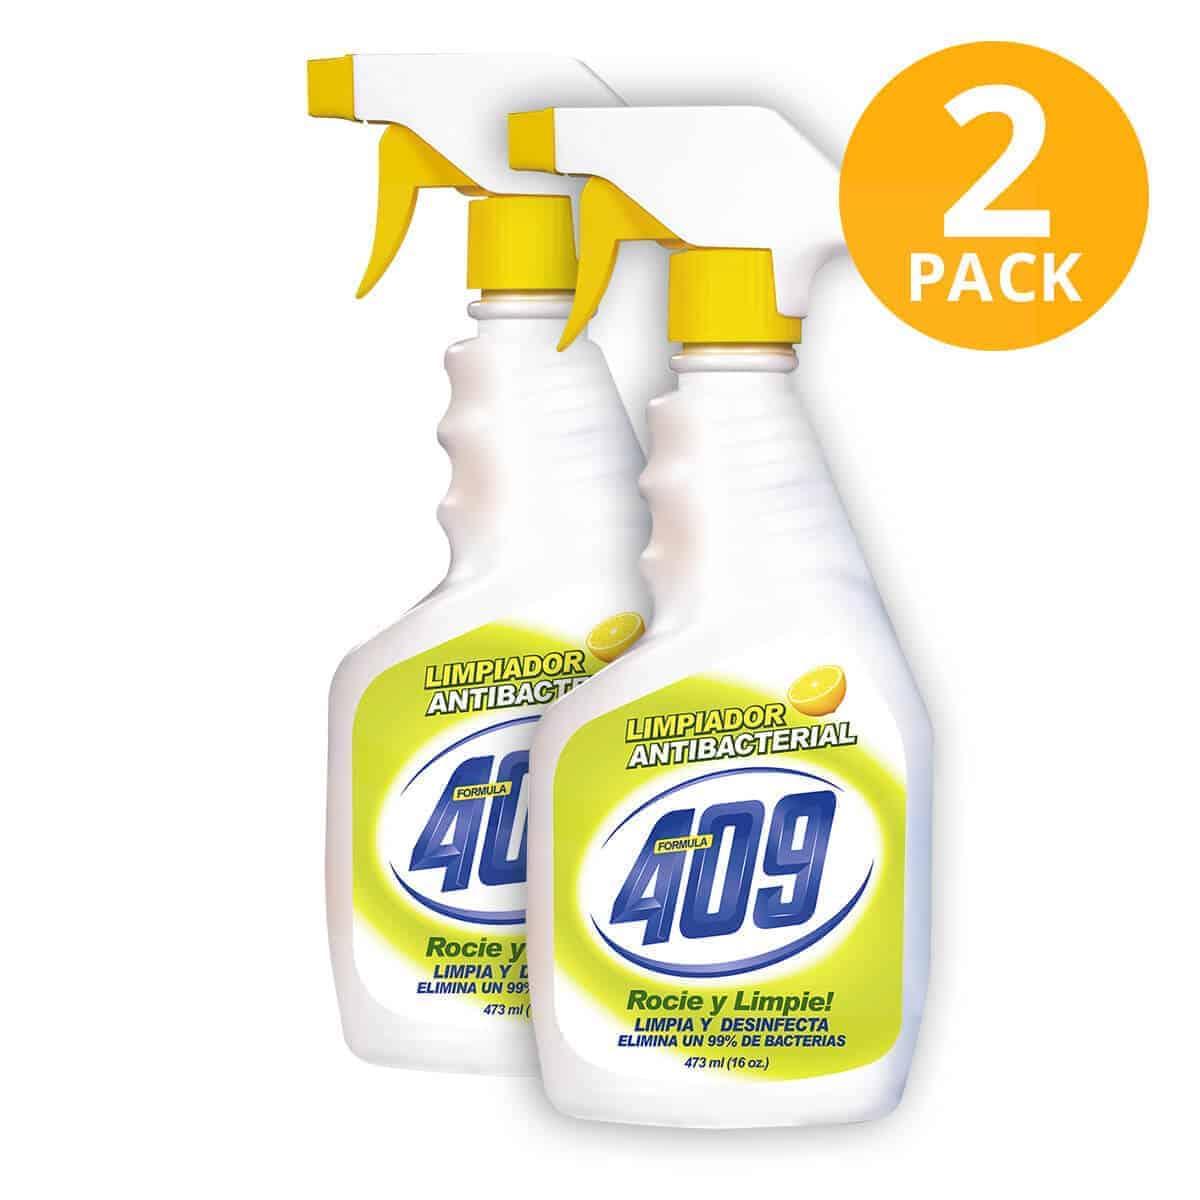 Limpiador 409 Antibacterial Bactilimon, 32 OZ (Pack de 2)